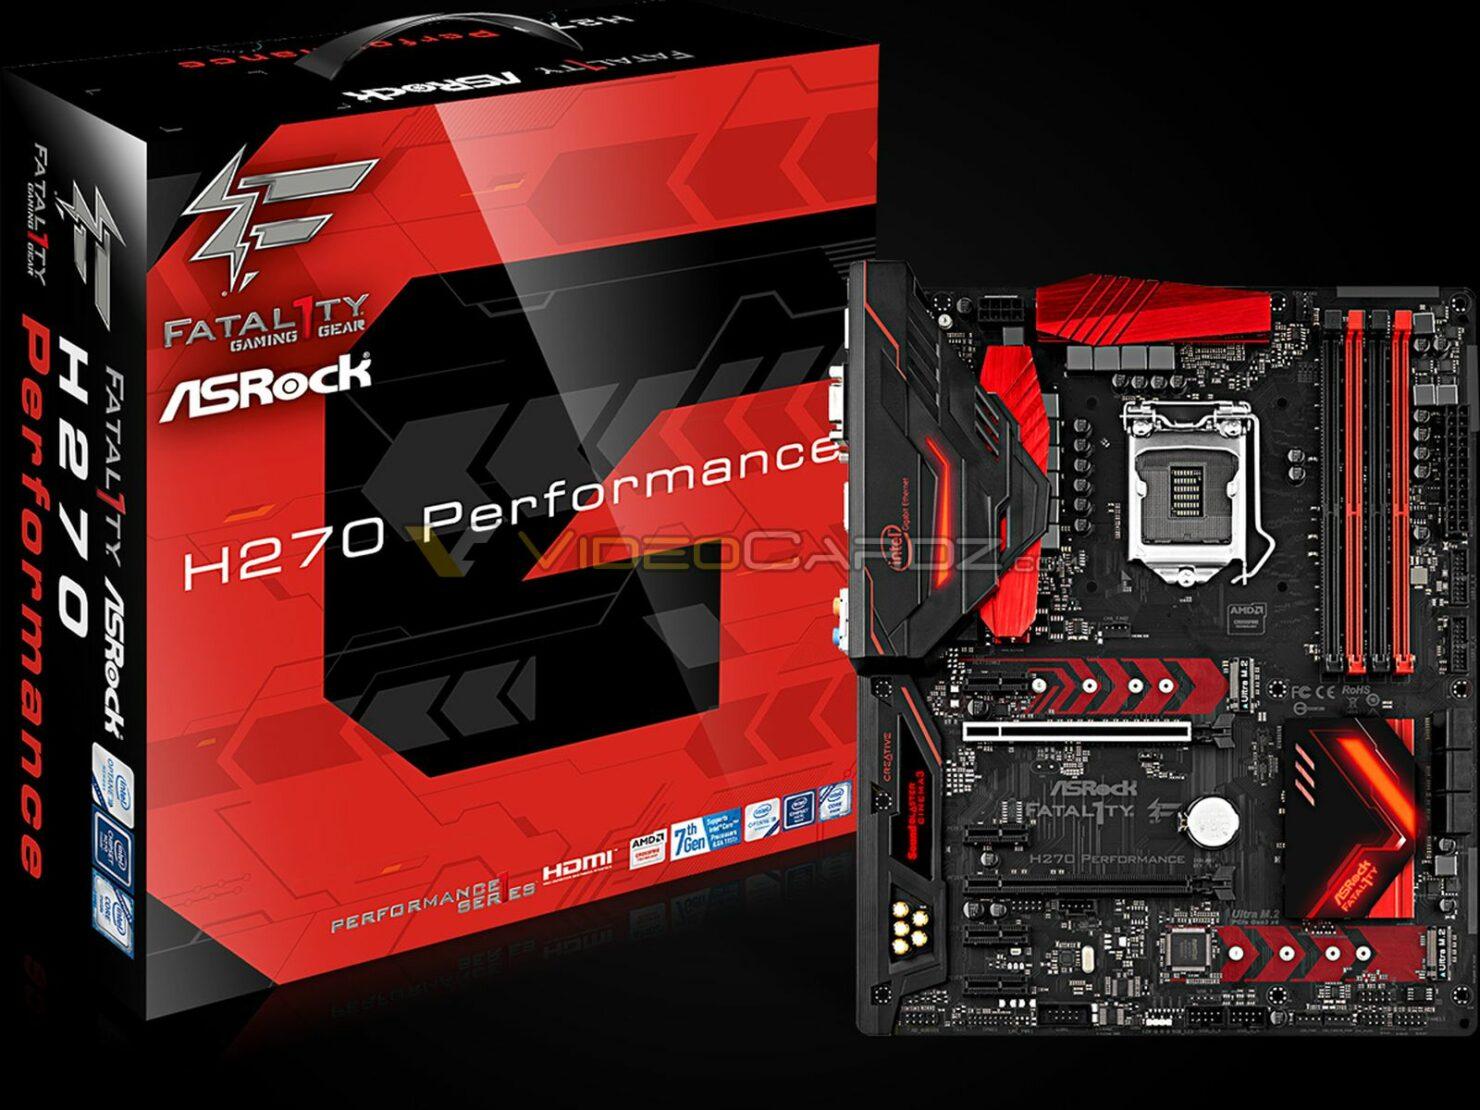 asrock-h270-performance-2